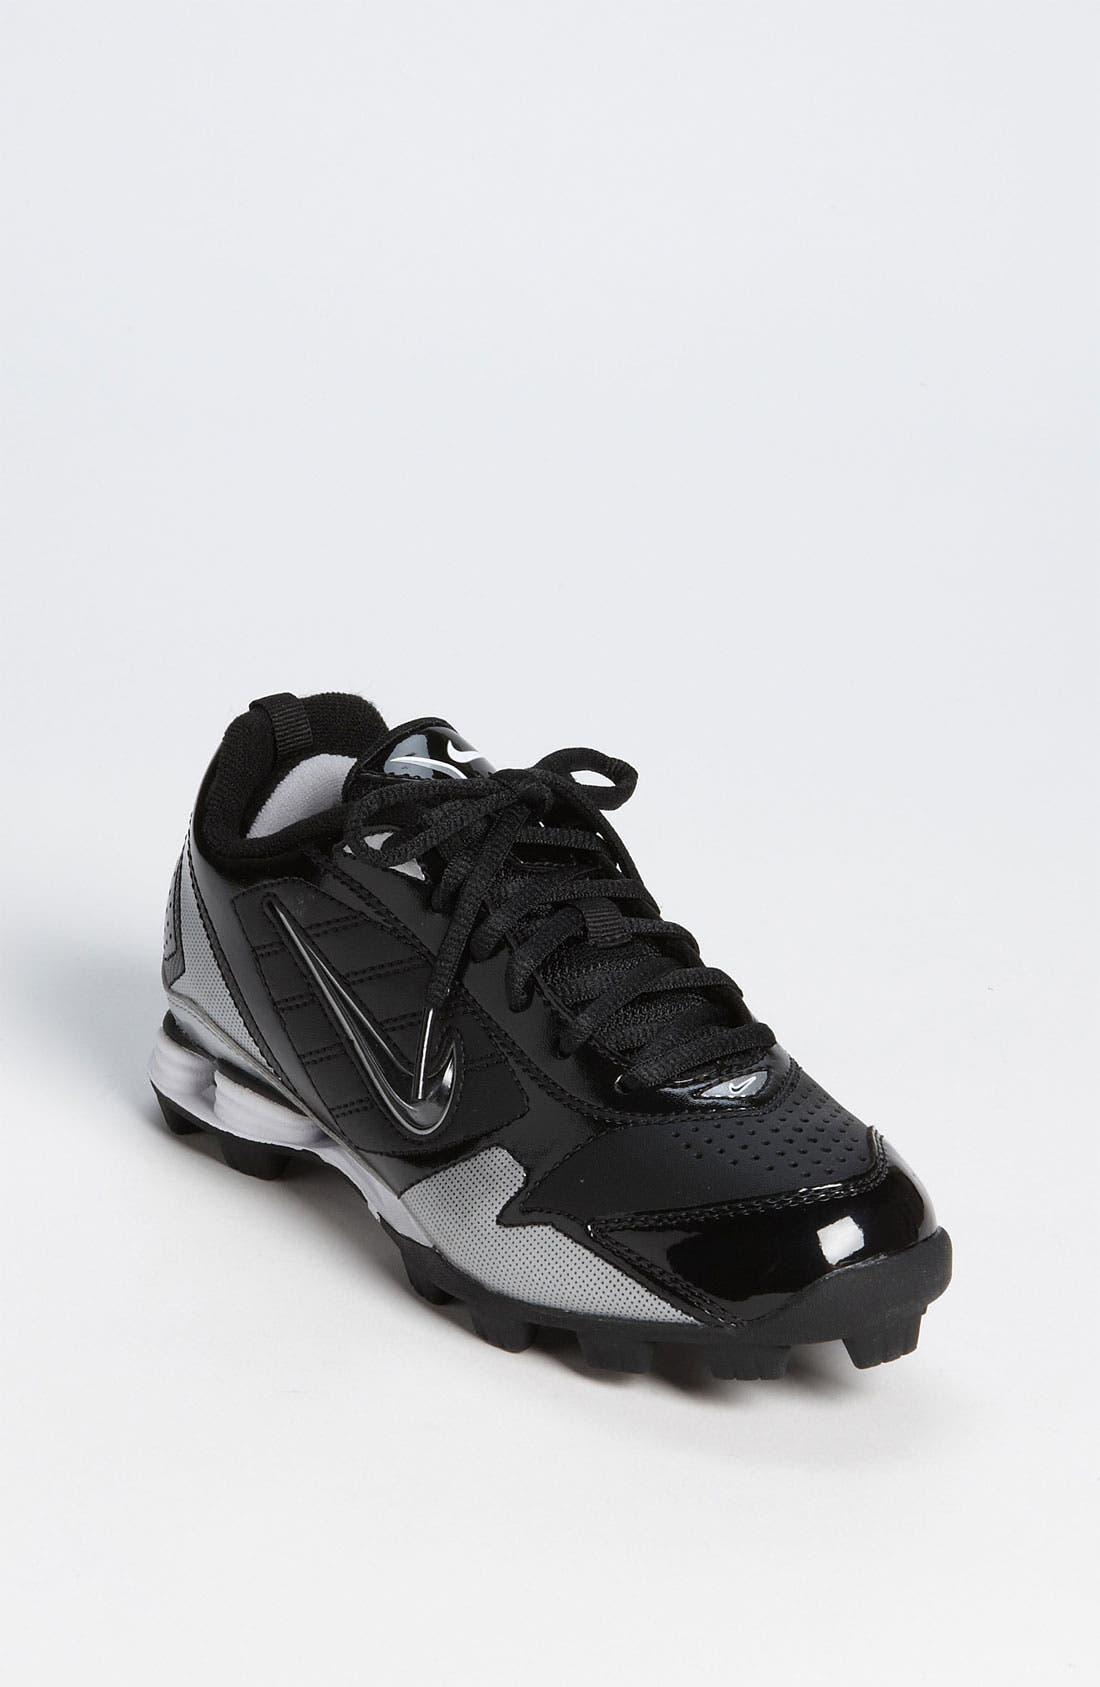 Alternate Image 1 Selected - Nike 'Fuse' Baseball Cleat (Toddler, Little Kid & Big Kid)